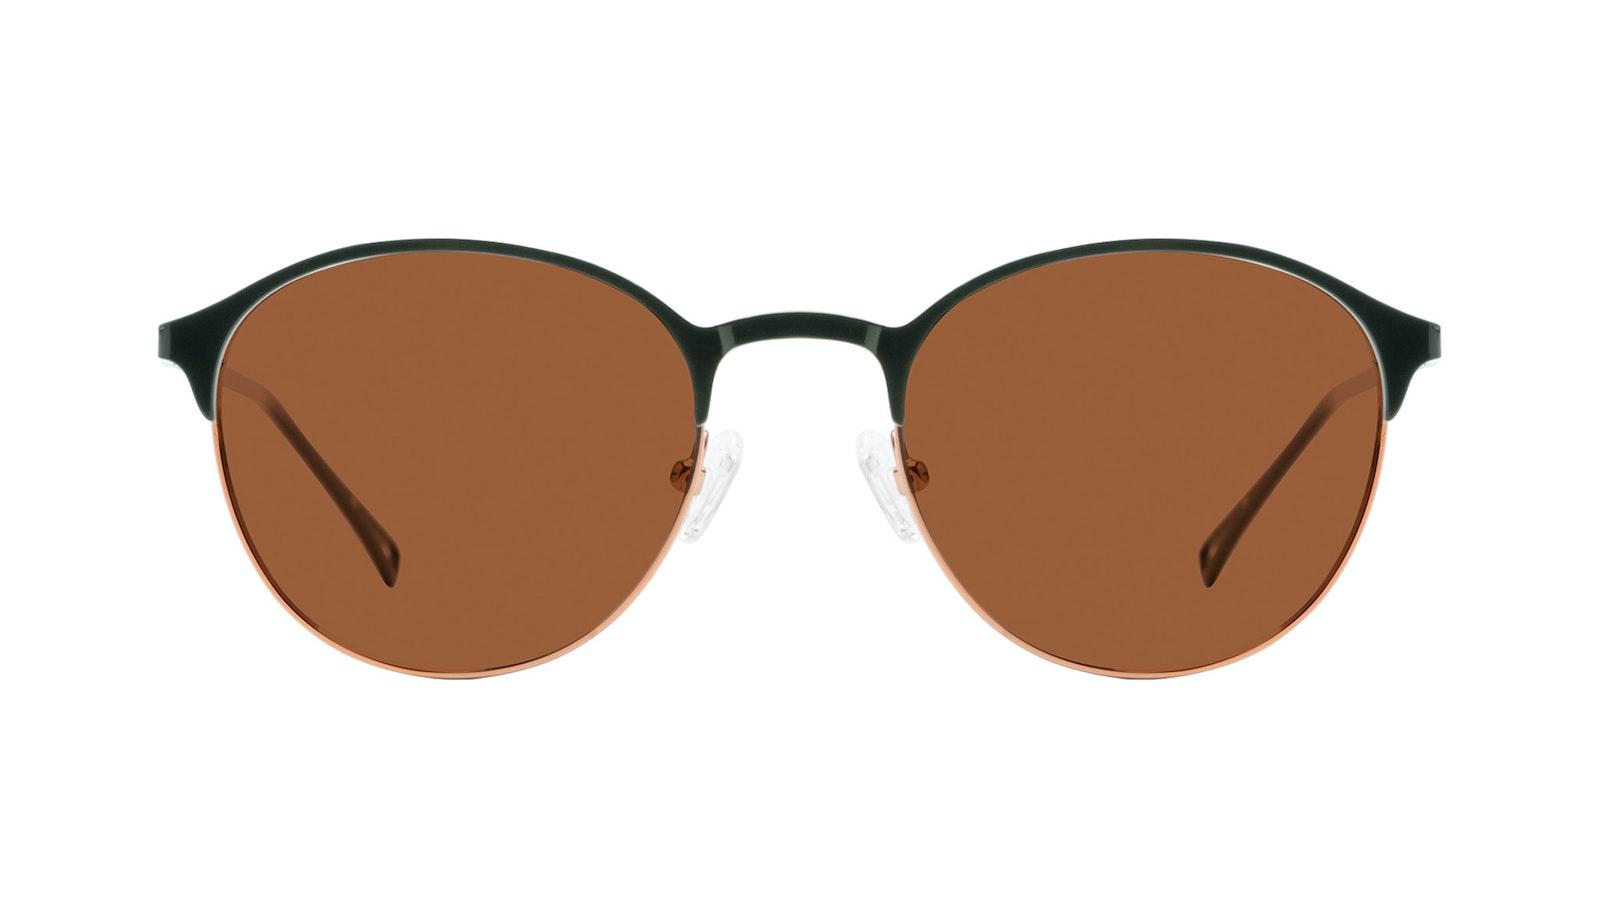 Affordable Fashion Glasses Round Sunglasses Women Bay Emeraude